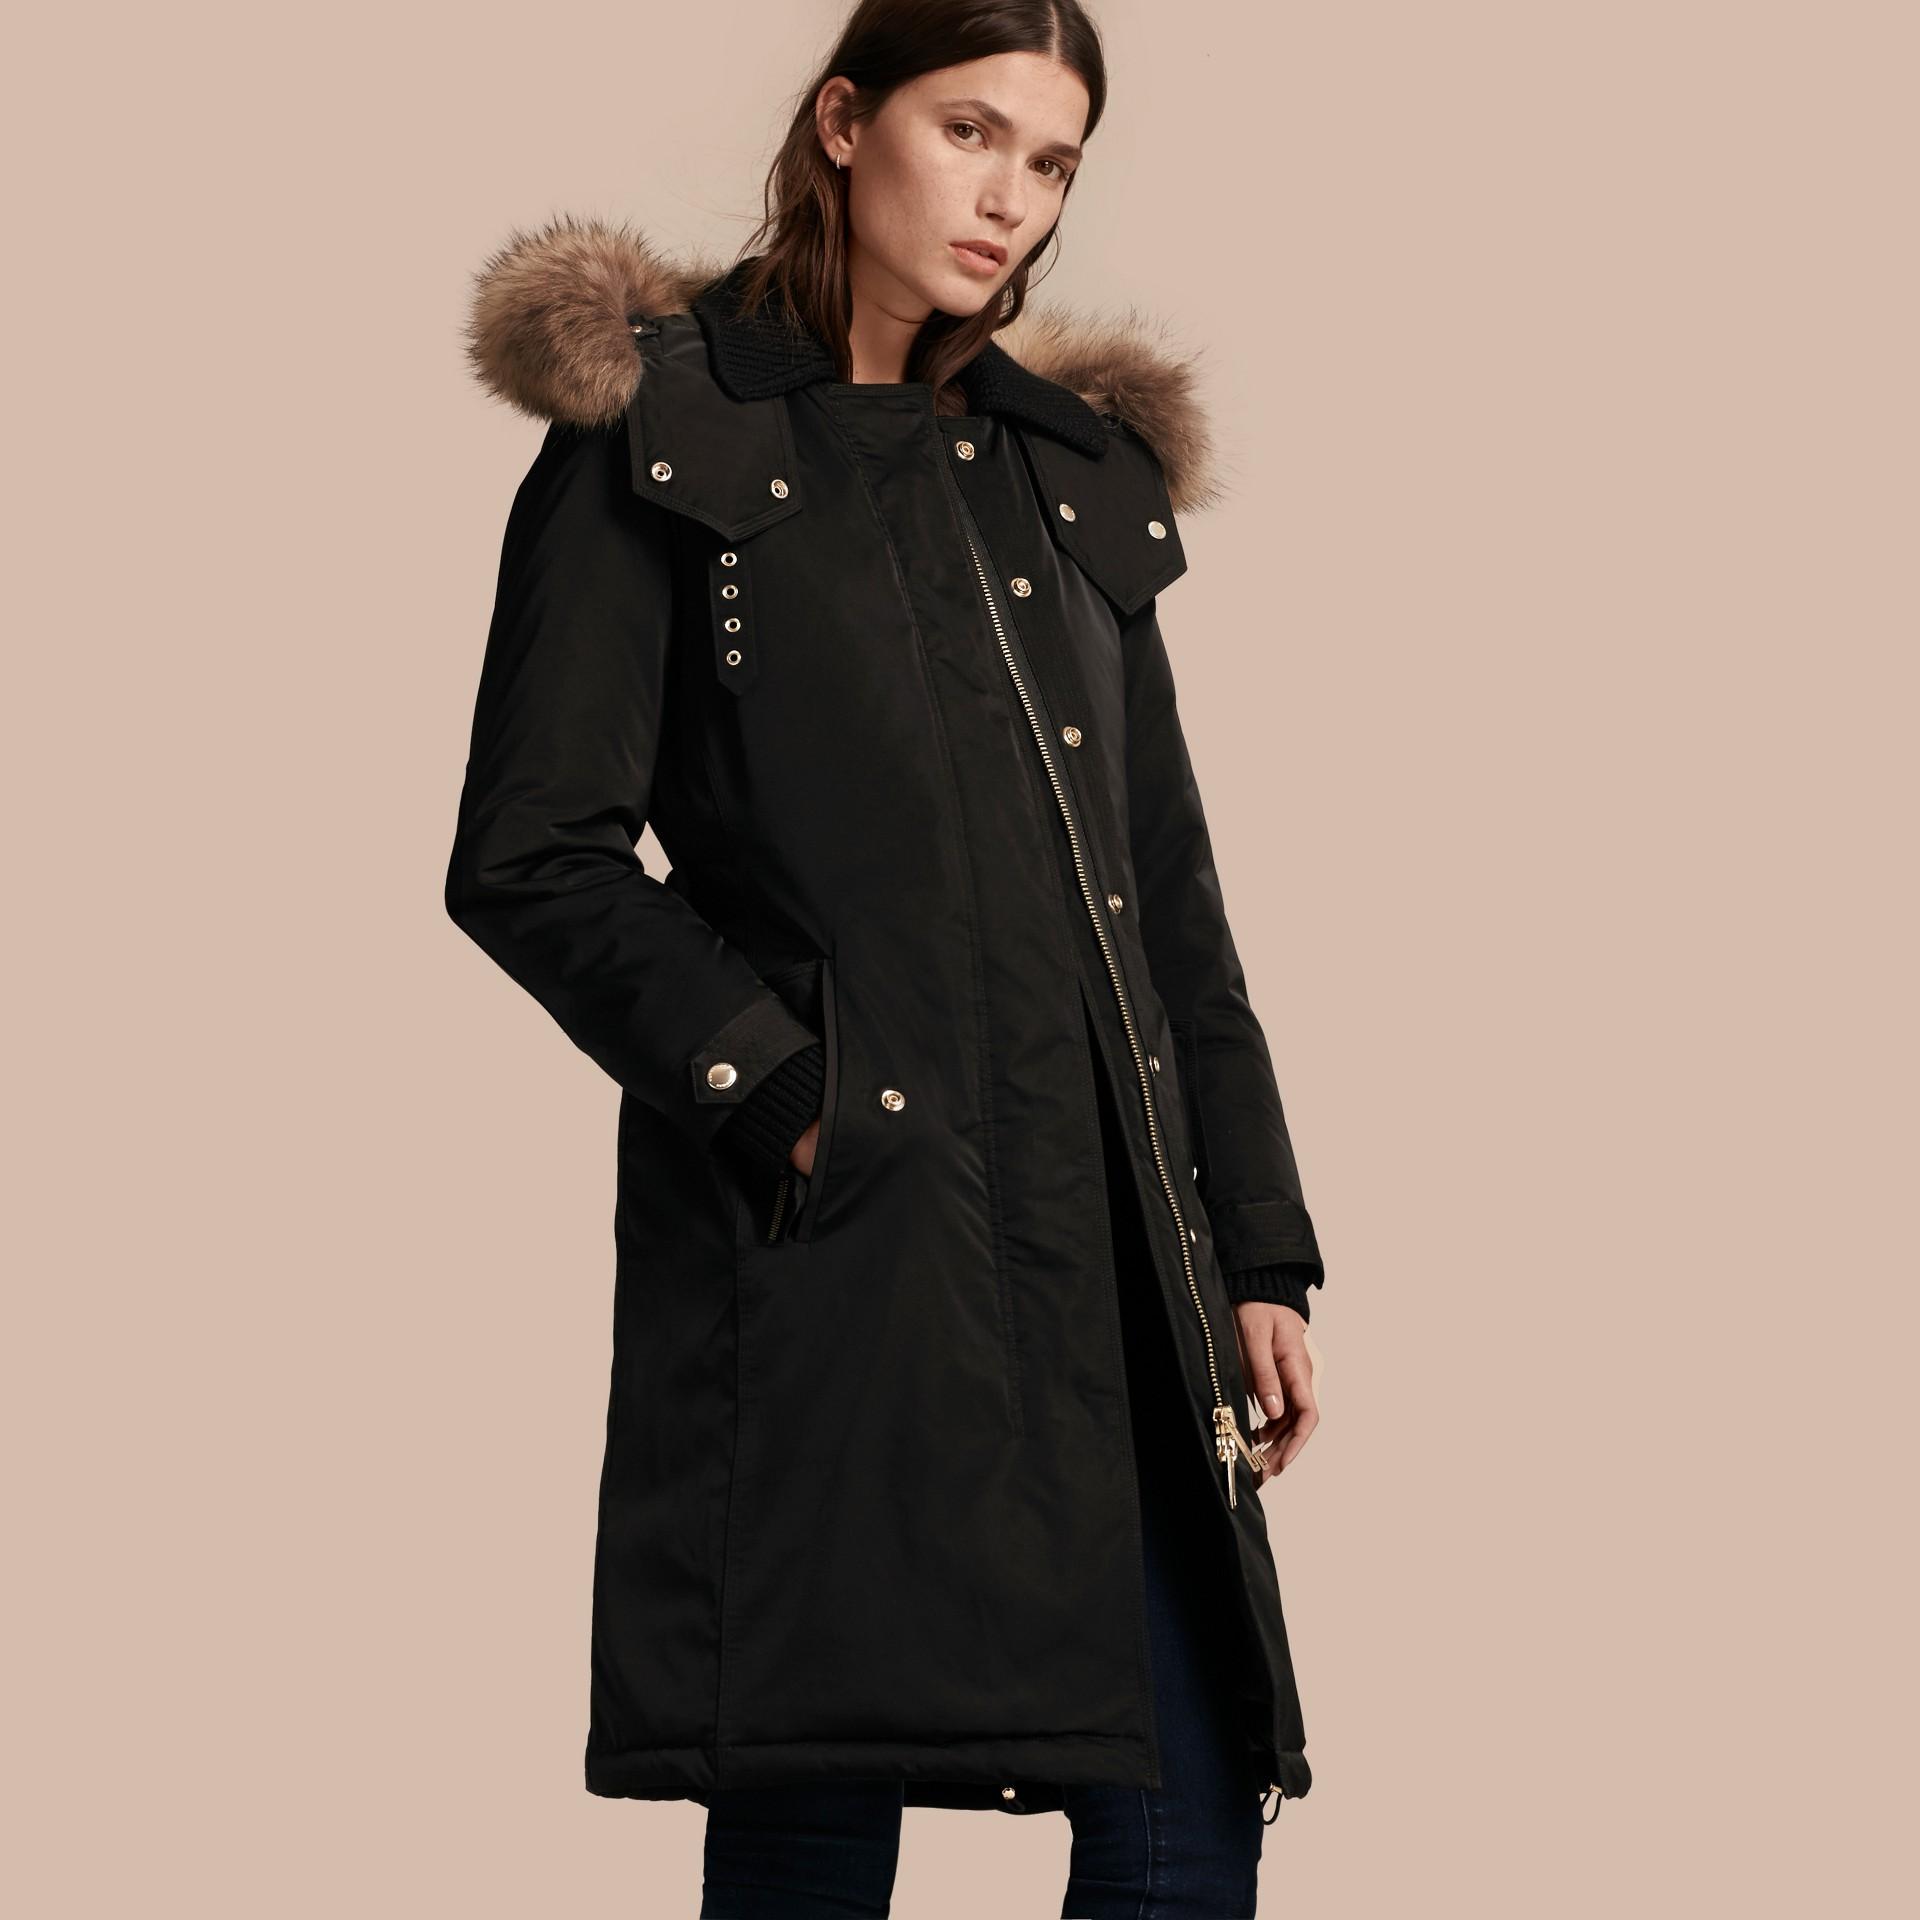 Black Down-filled Parka Coat with Detachable Fur Trim Black - gallery image 1